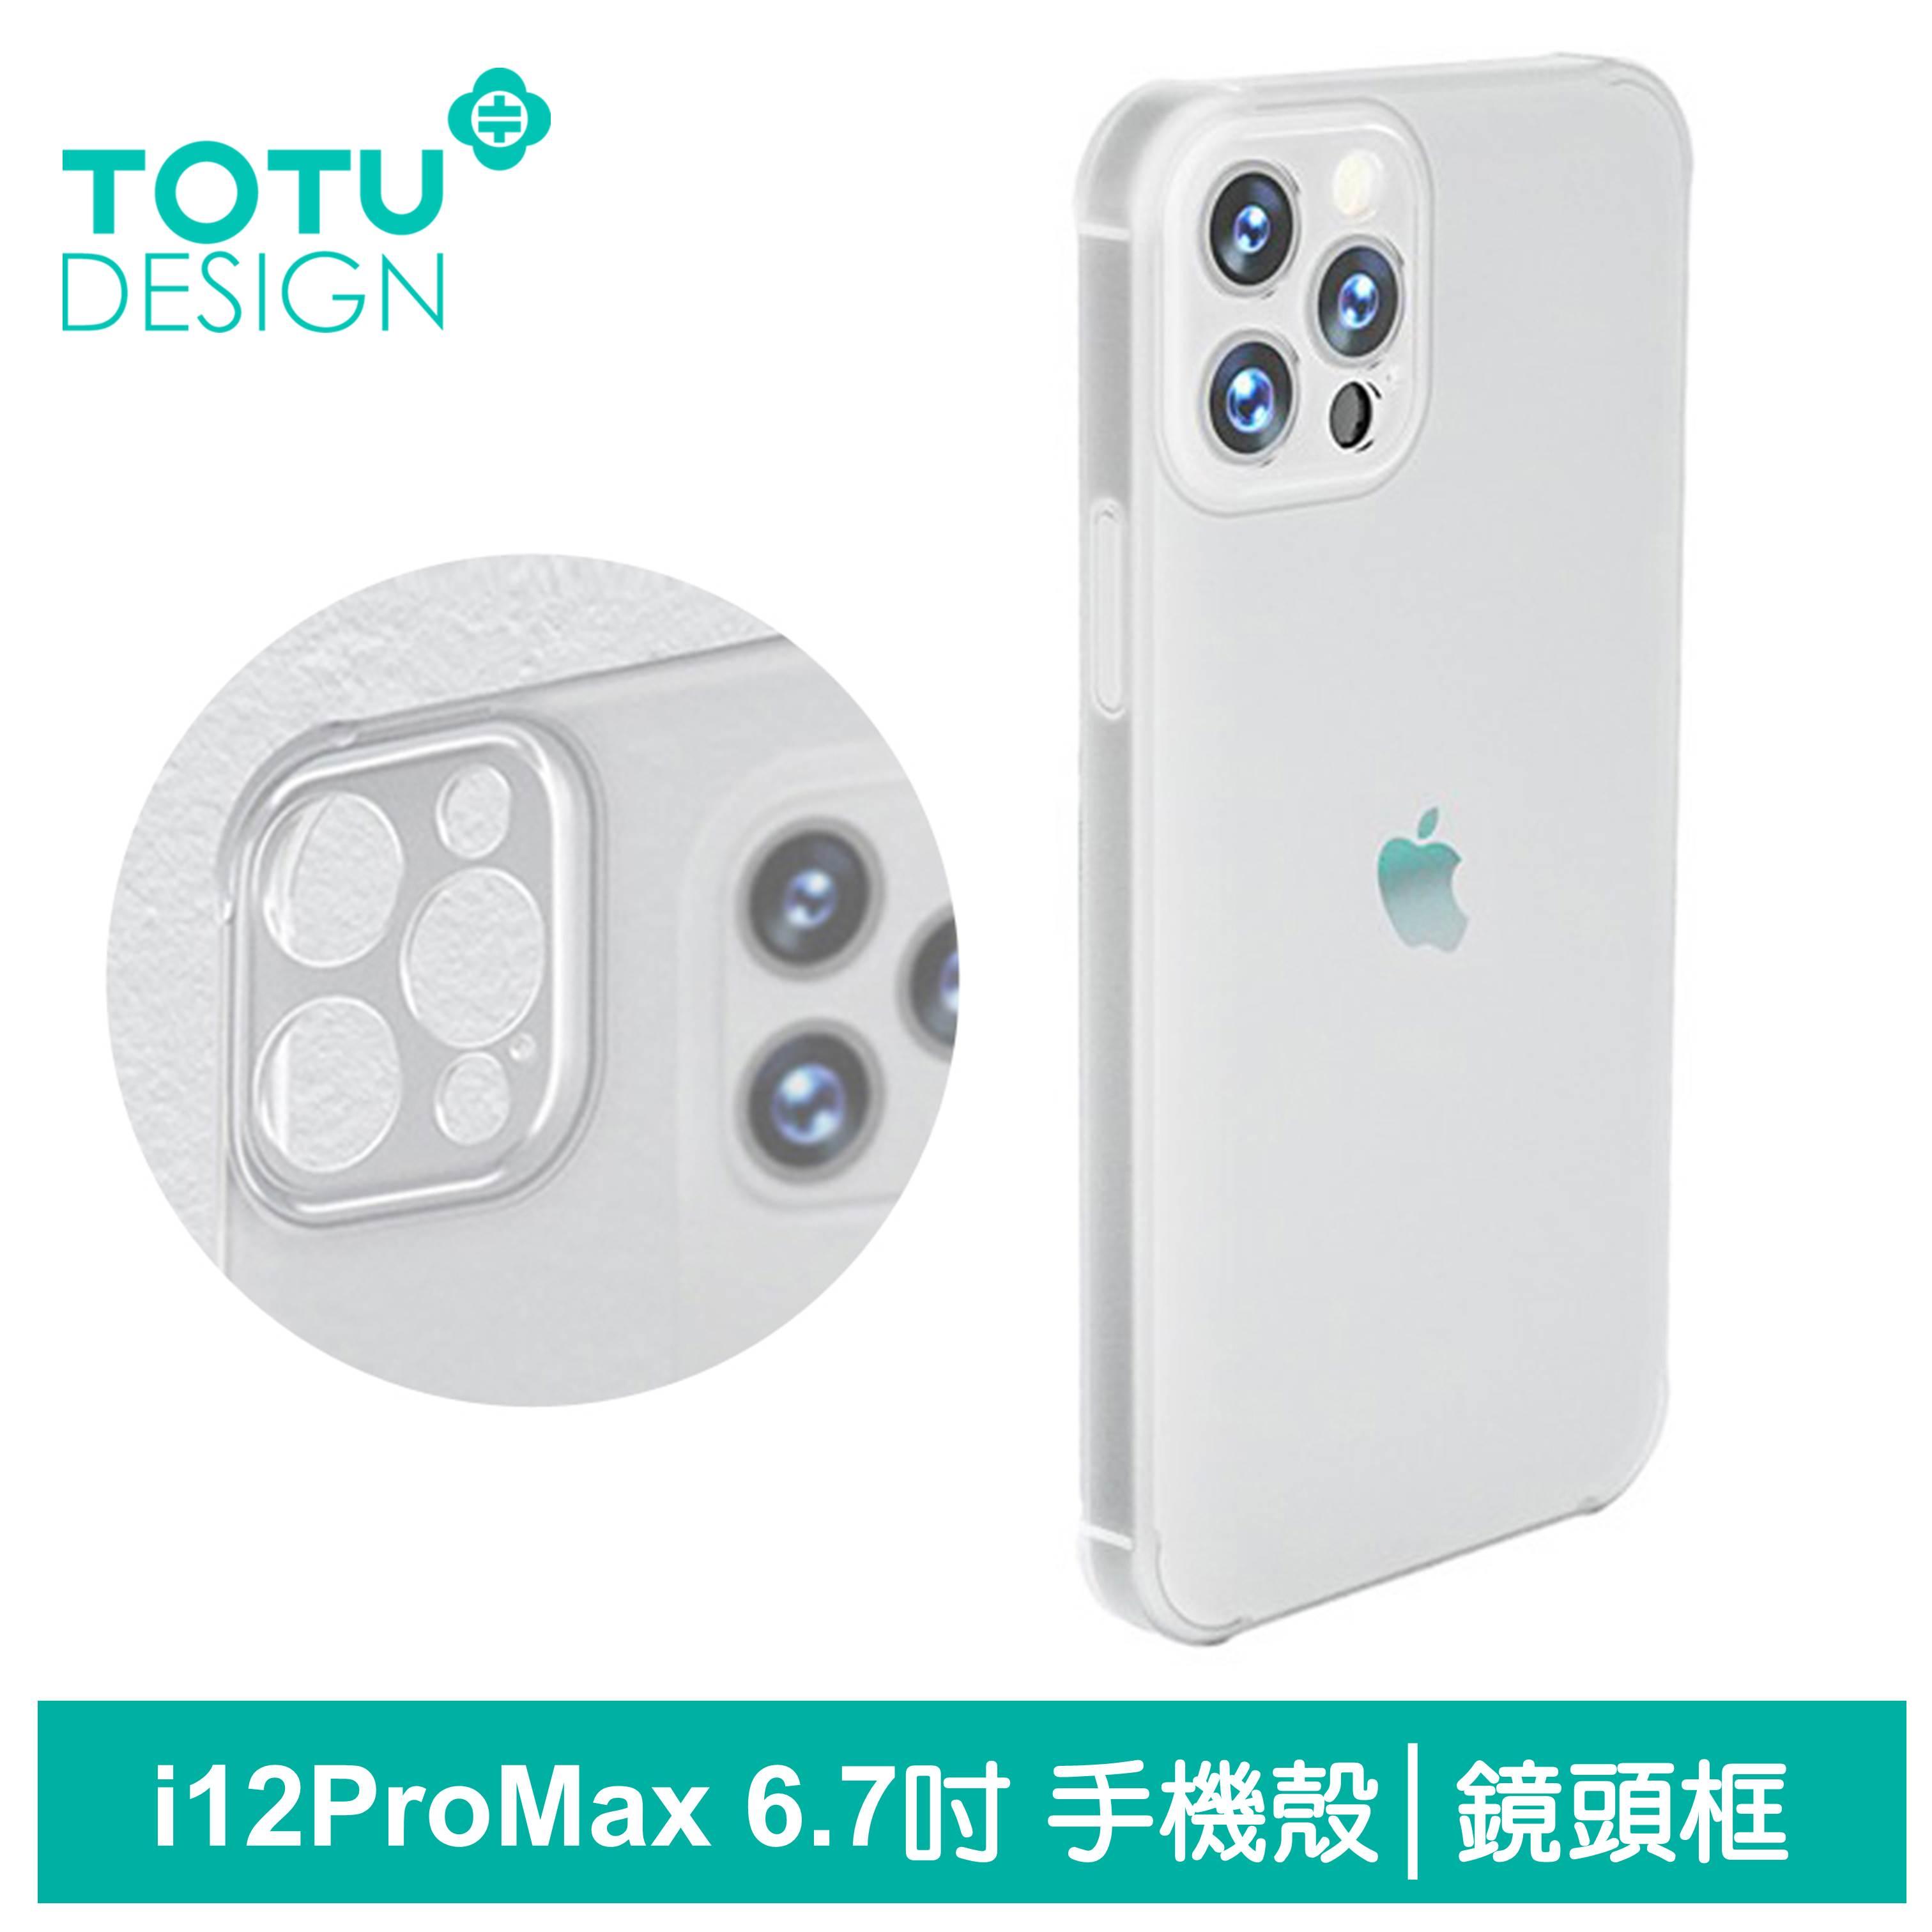 TOTU台灣官方 iPhone 12 Pro Max 6.7吋 手機殼防摔殼保護殼鏡頭框全包硬殼 零感系列 透白